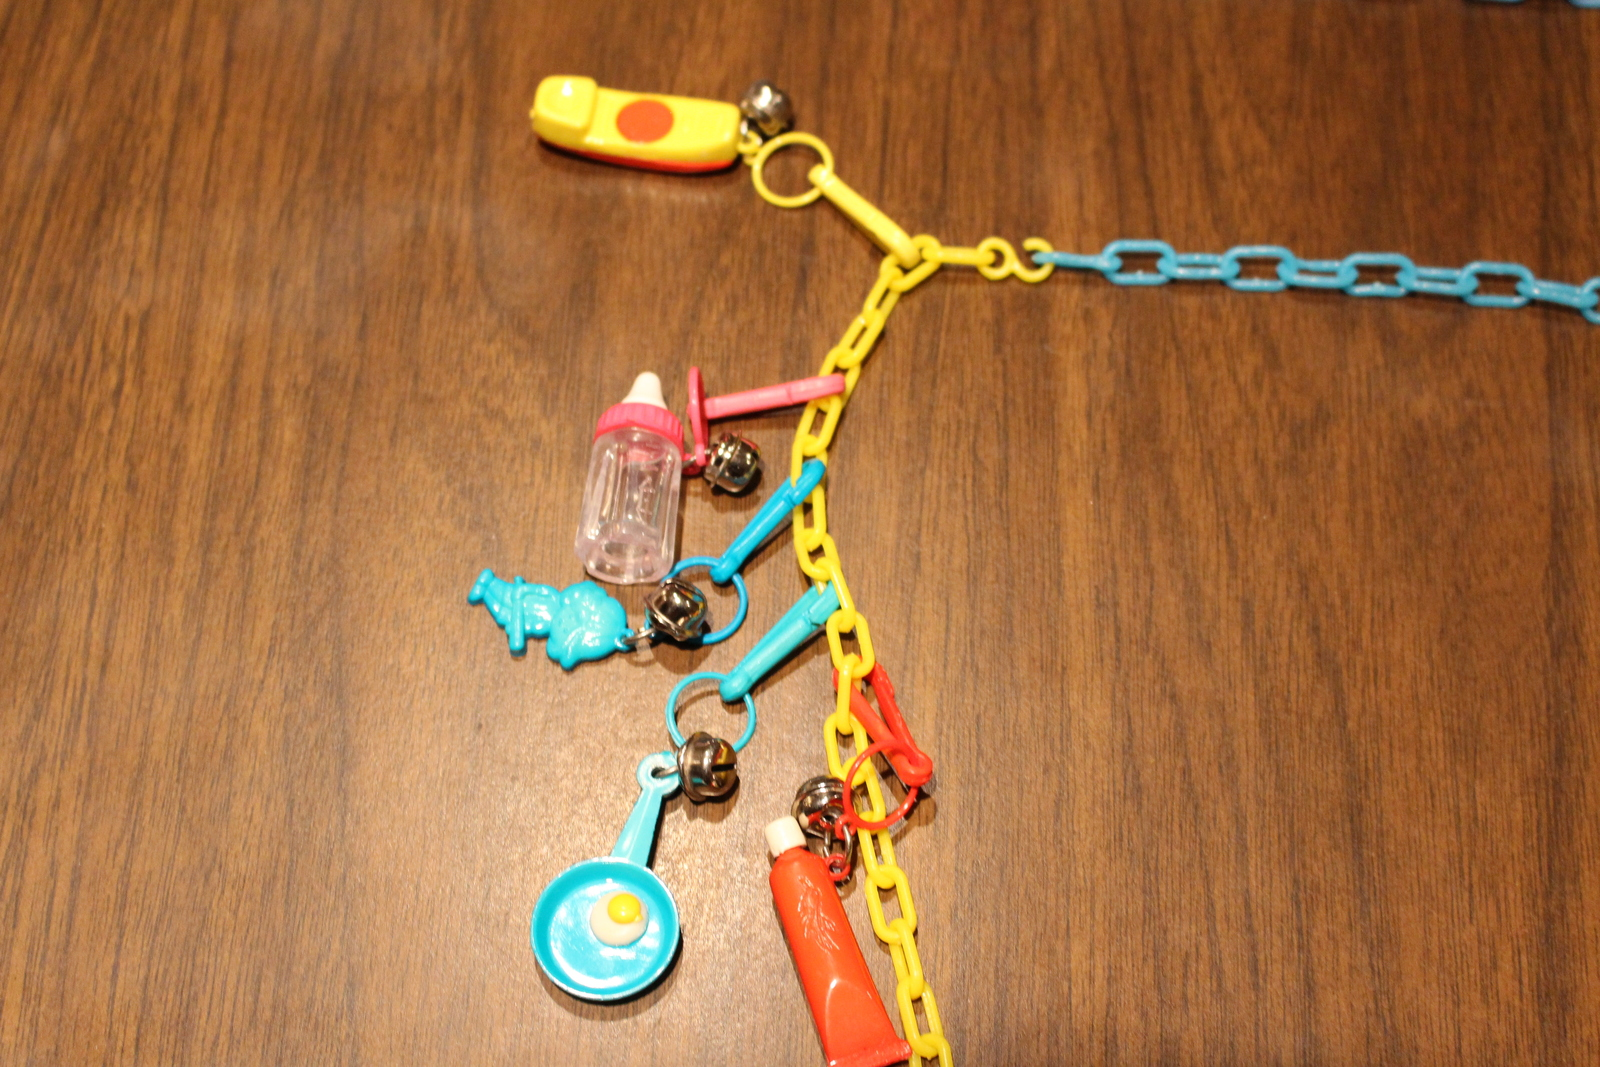 Rare Vintage Retro Original Plastic Bell Clip Charm Toy Necklace 80's